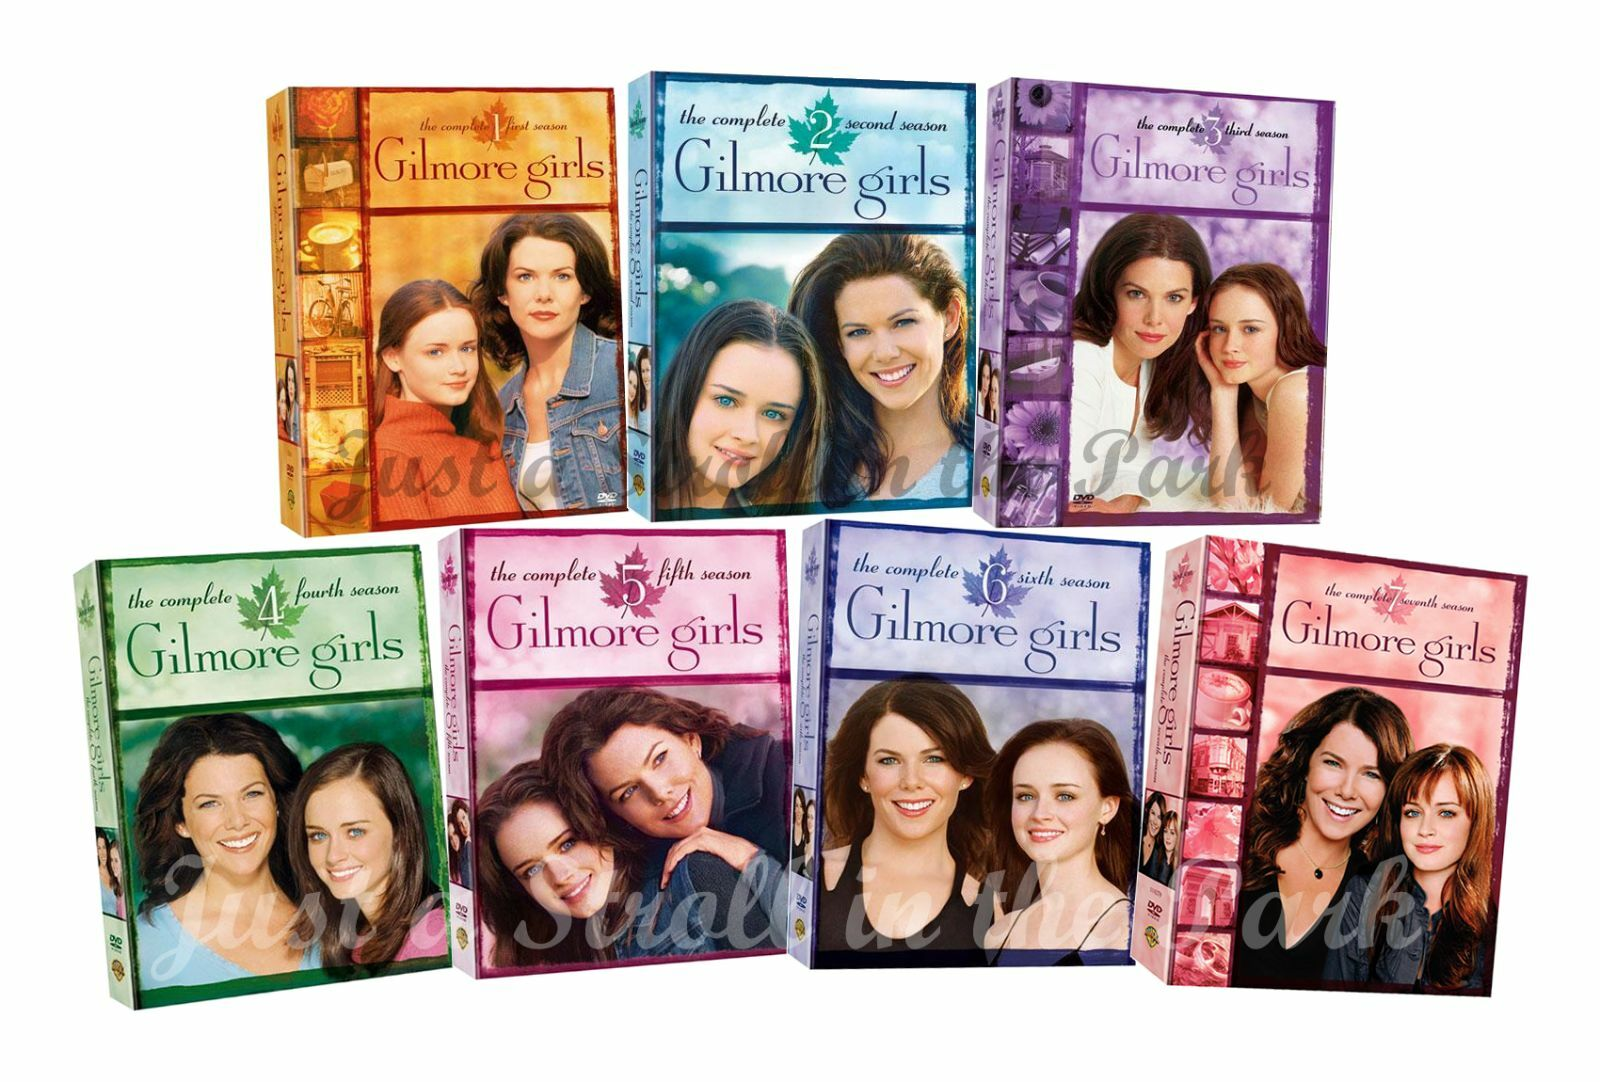 gilmore girls complete series season 1 2 3 4 5 6 7 box dvd set s new. Black Bedroom Furniture Sets. Home Design Ideas